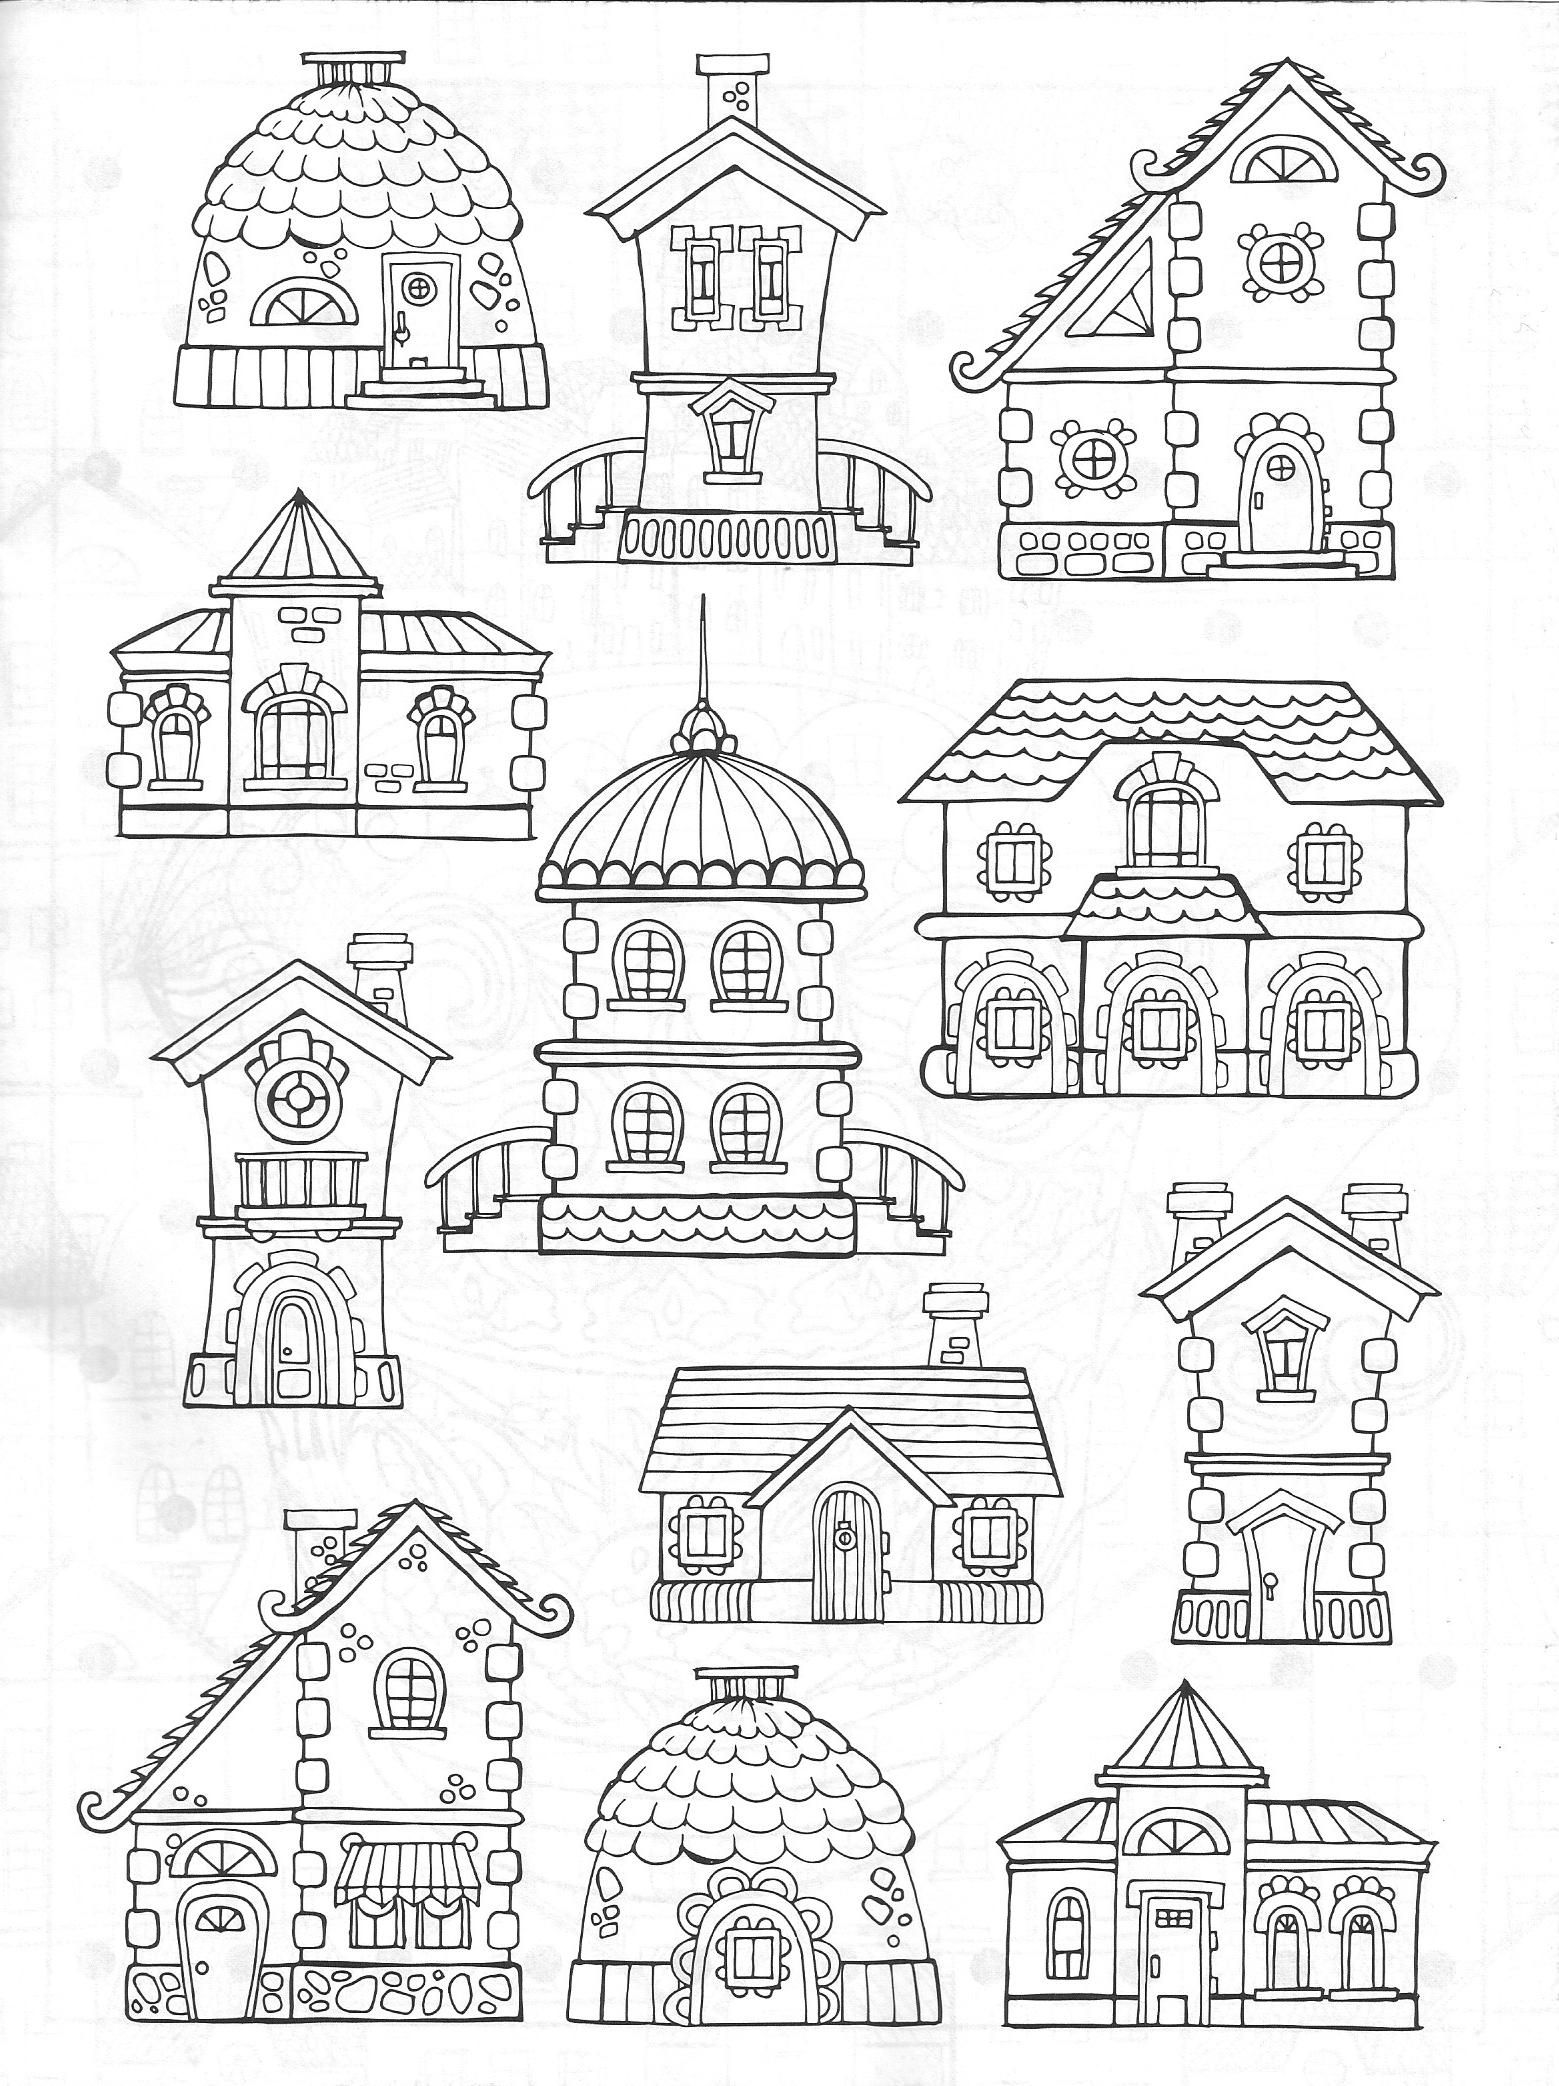 vida simples cidade dos sonhos para colorir casas e